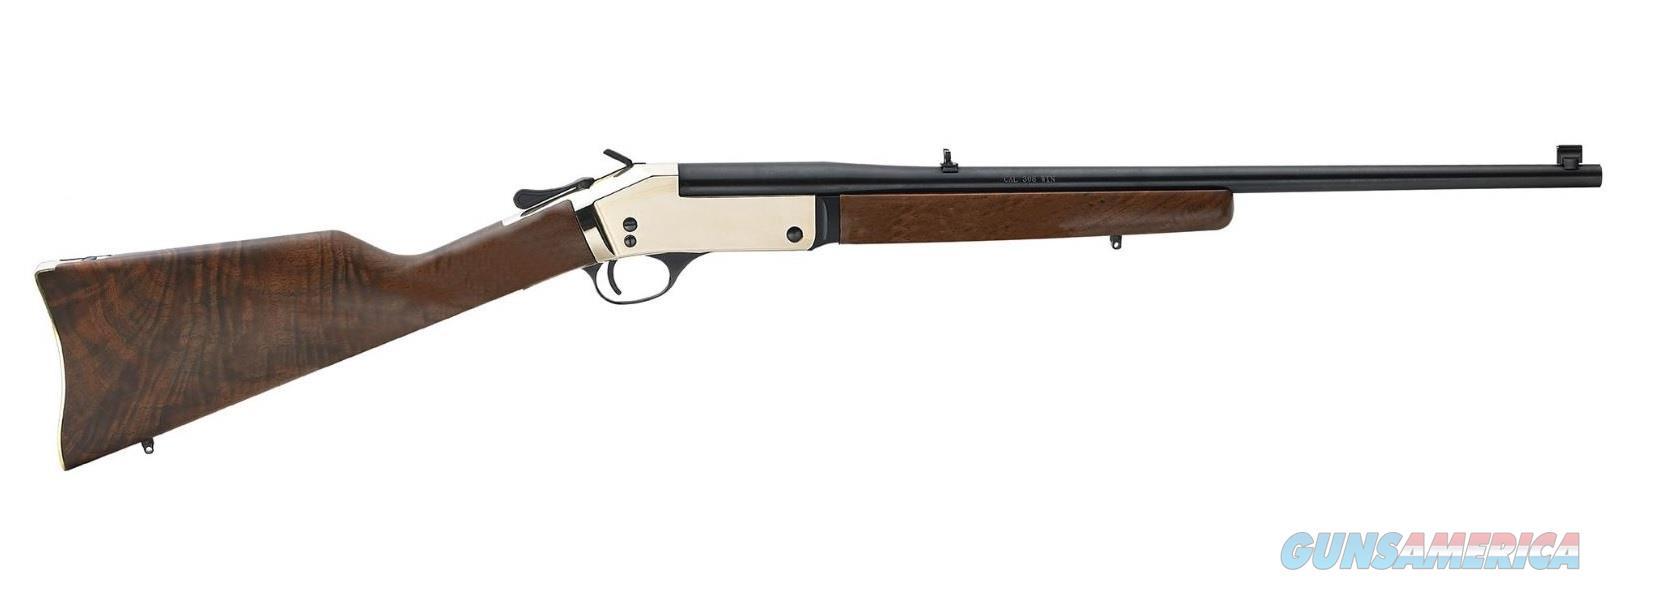 "Henry Brass Single Shot Rifle .44 Magnum/.44 Special 22"" H015B-44  Guns > Rifles > Henry Rifle Company"